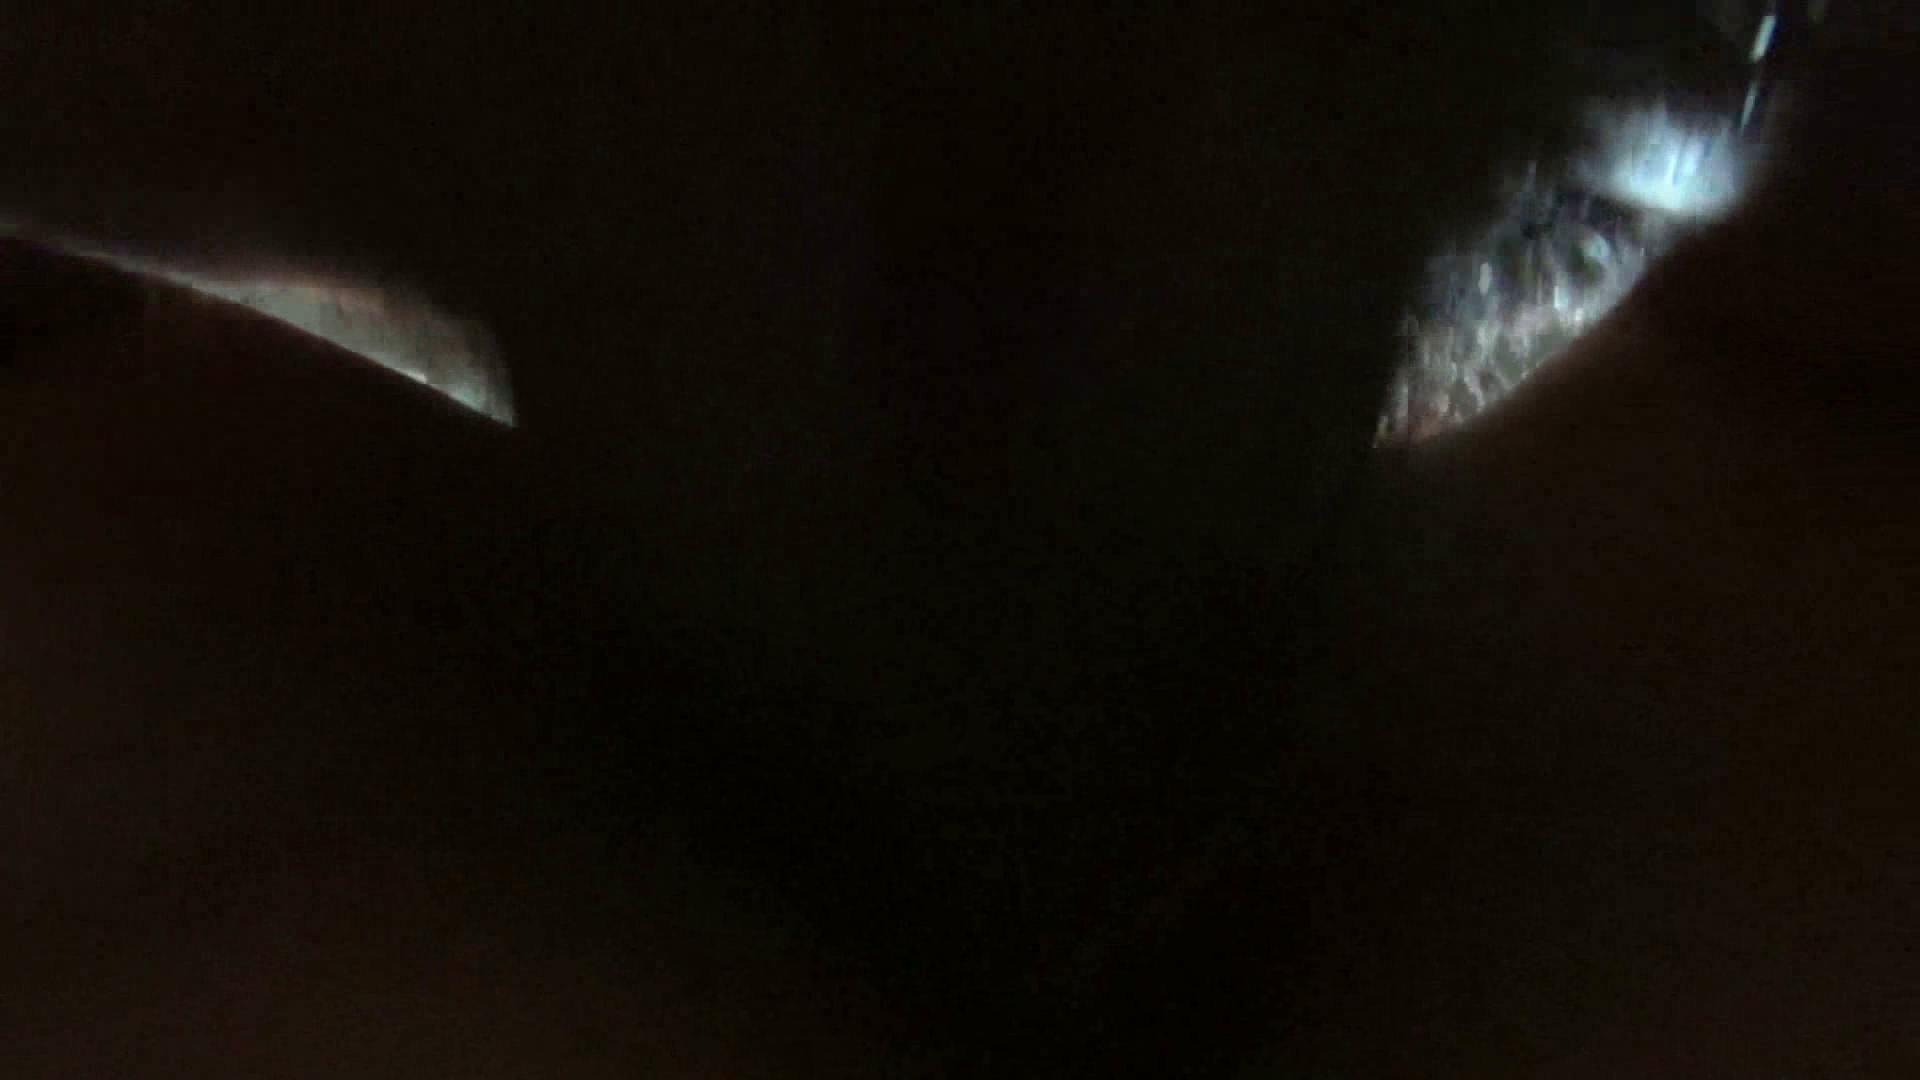 Vol.02 ご近所のGカップ人妻Y子。後編 OLエロ画像 盗み撮りオマンコ動画キャプチャ 41PICs 30